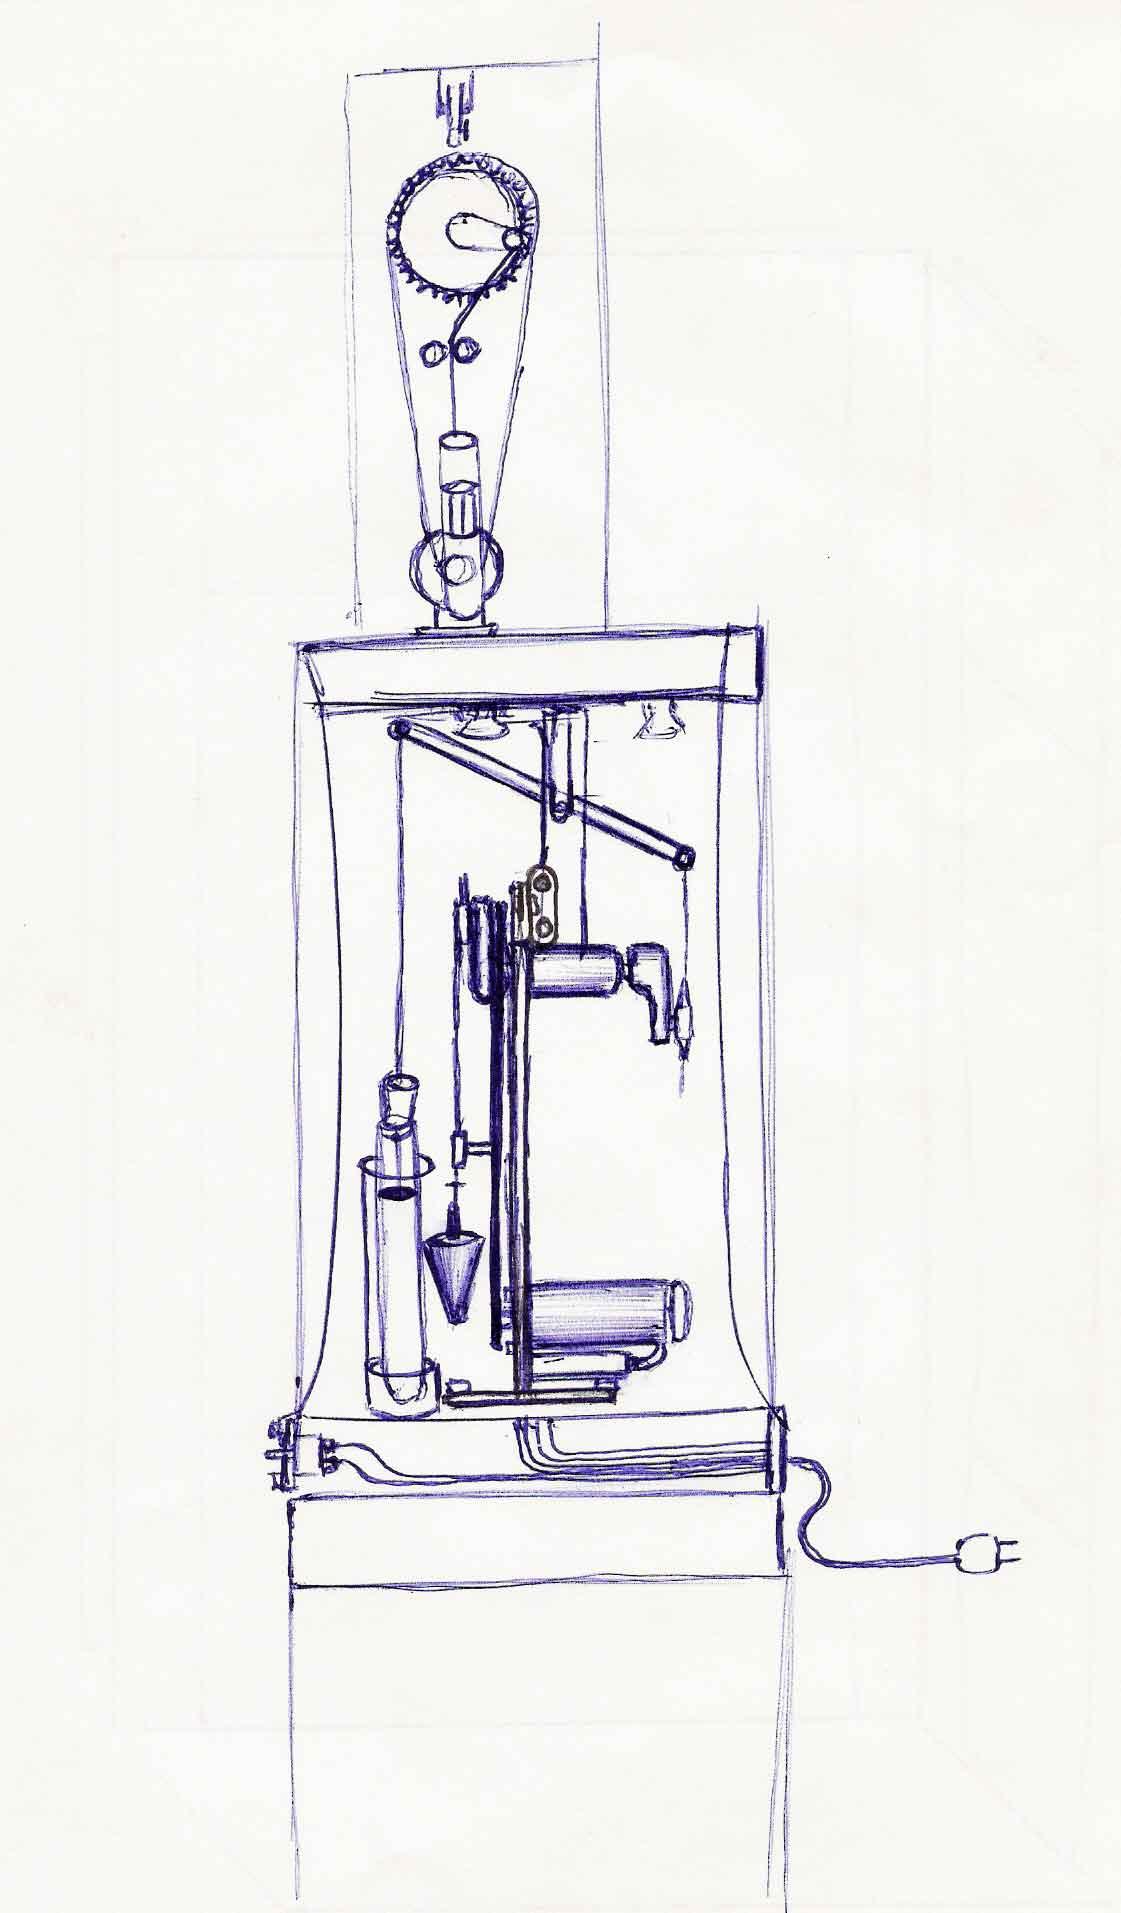 sketch-32-sept-05.jpg